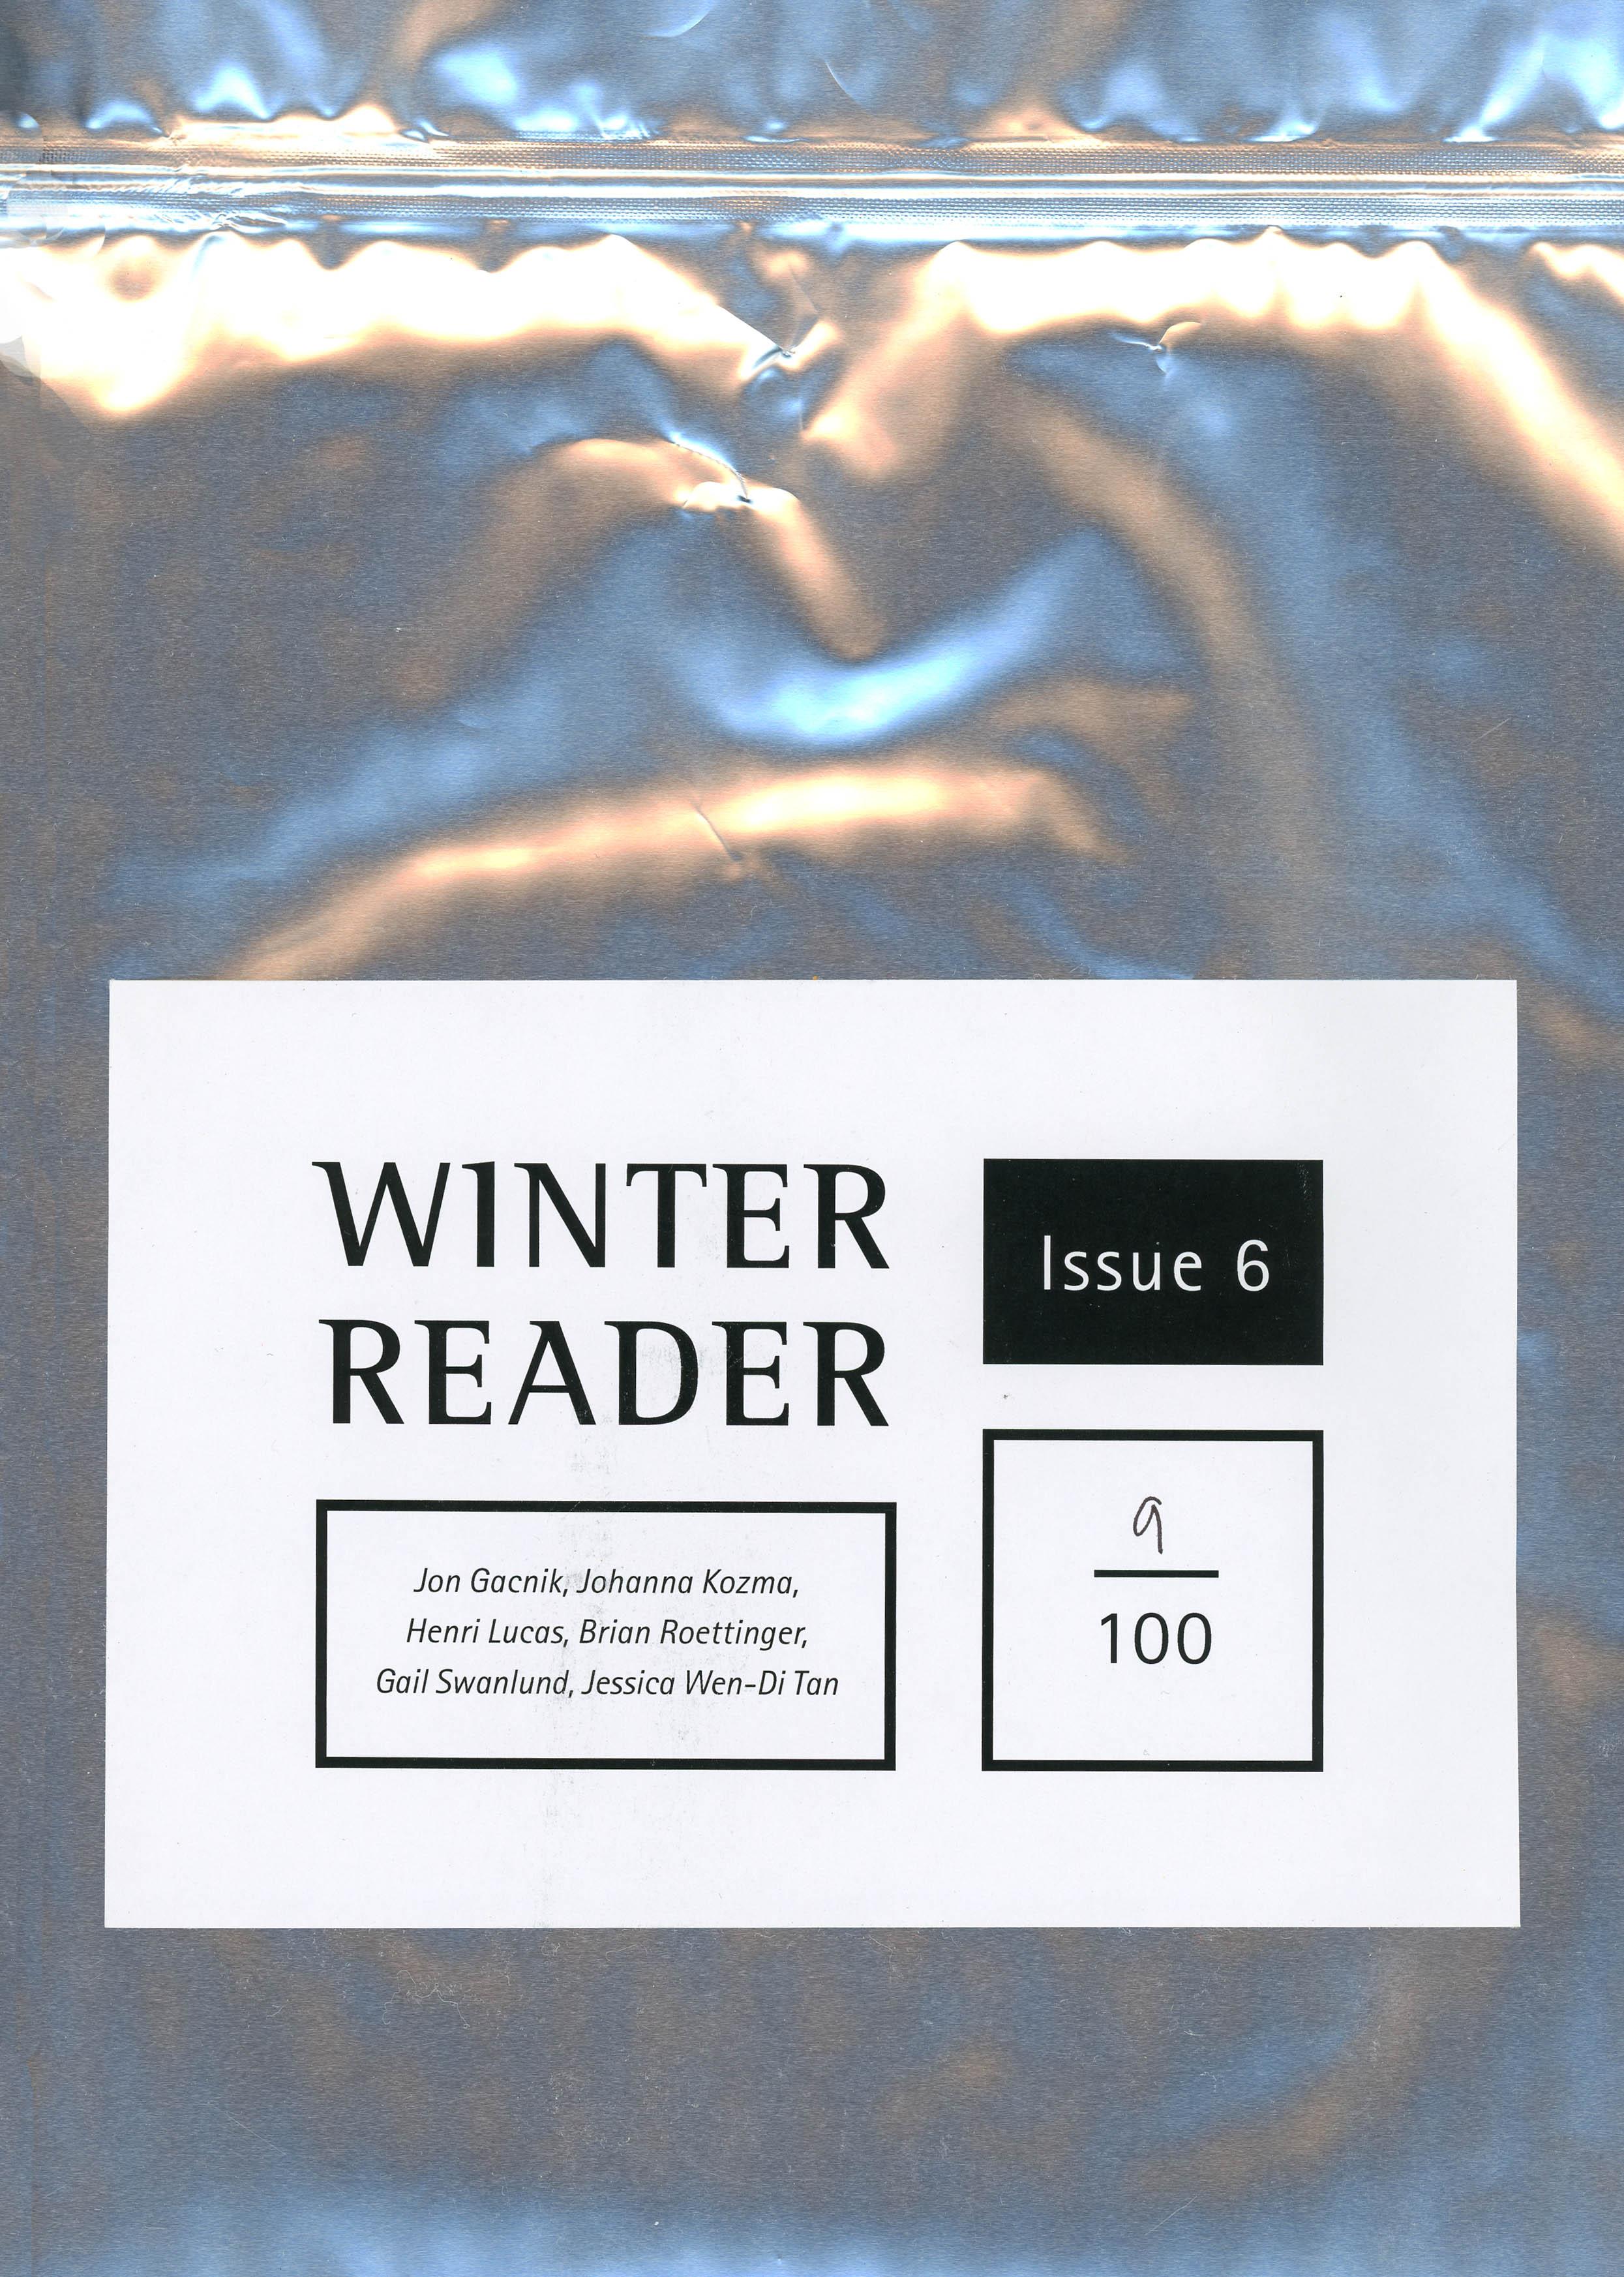 Winter 13, Issue 6